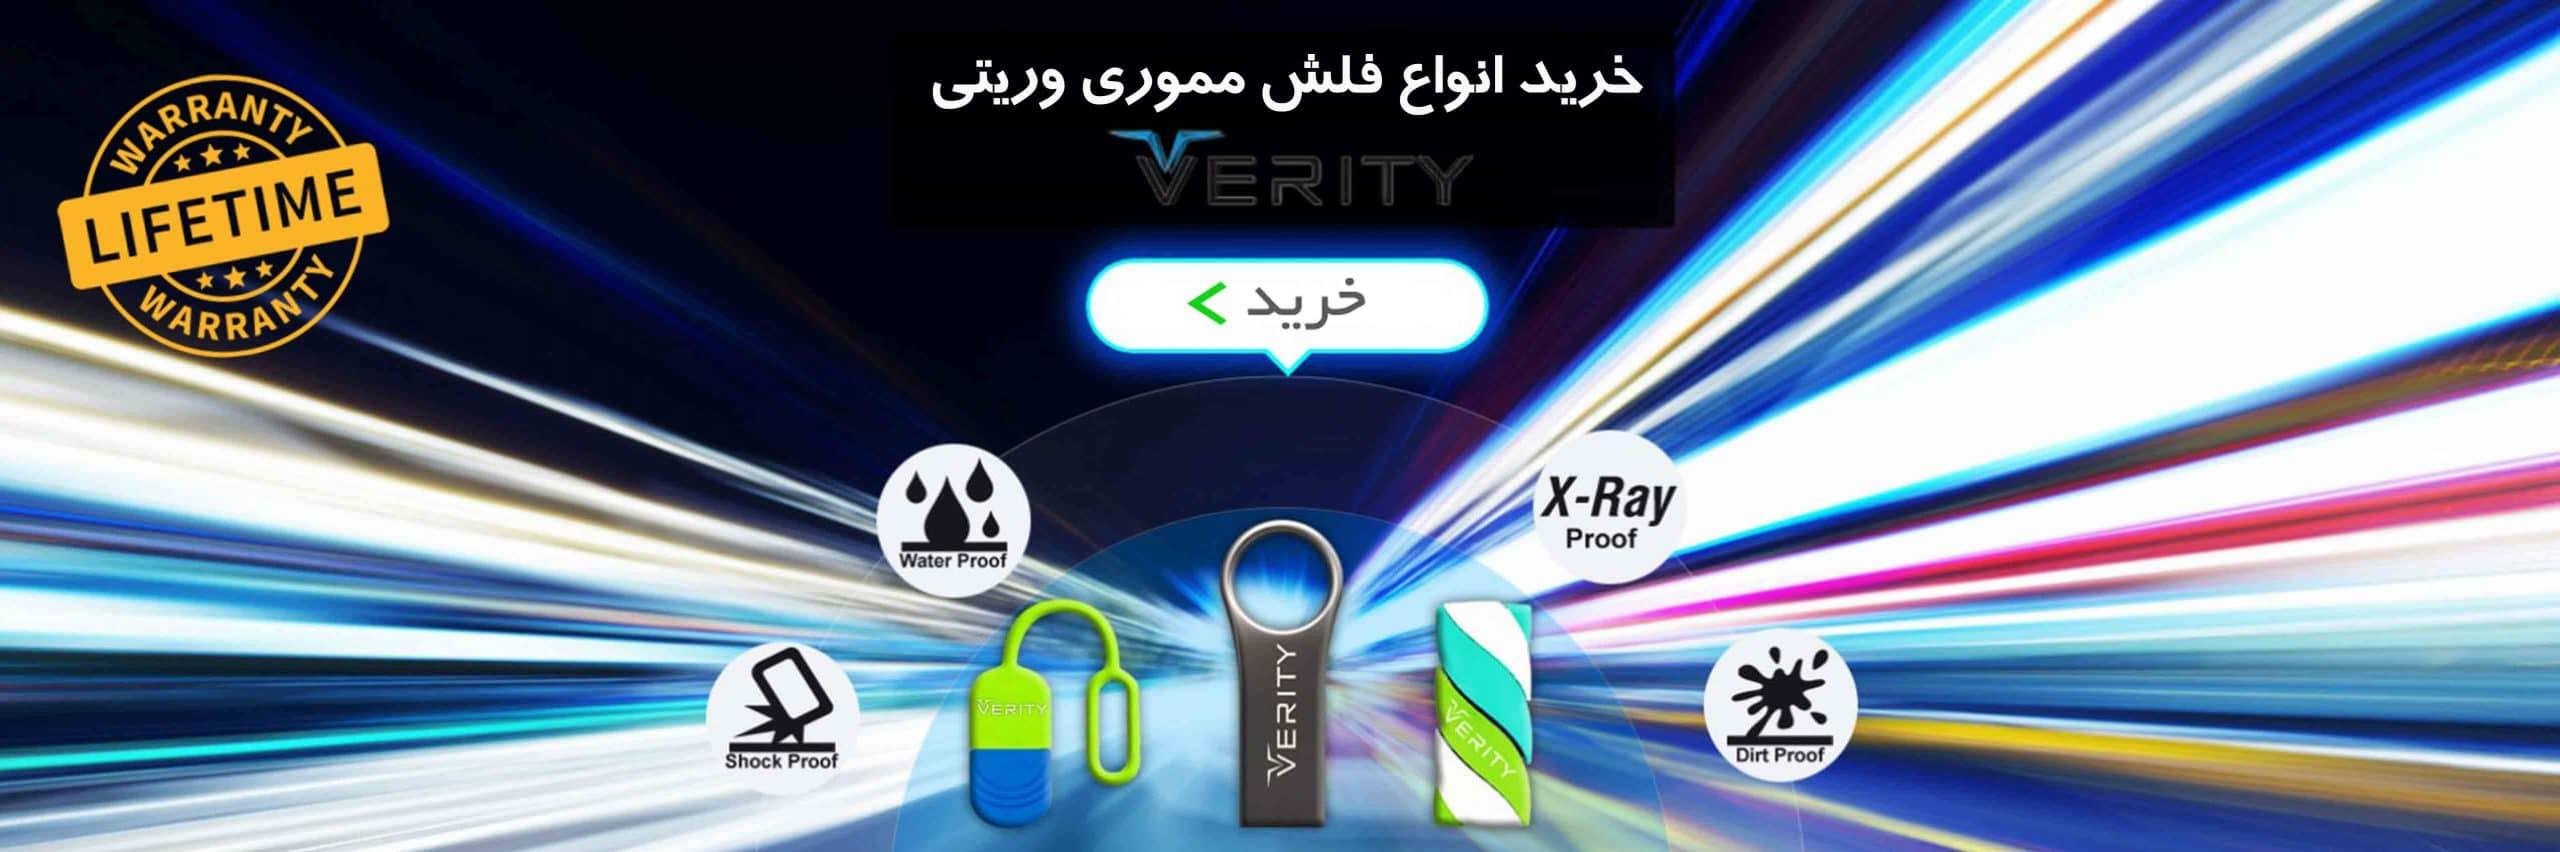 verity-flash-memory